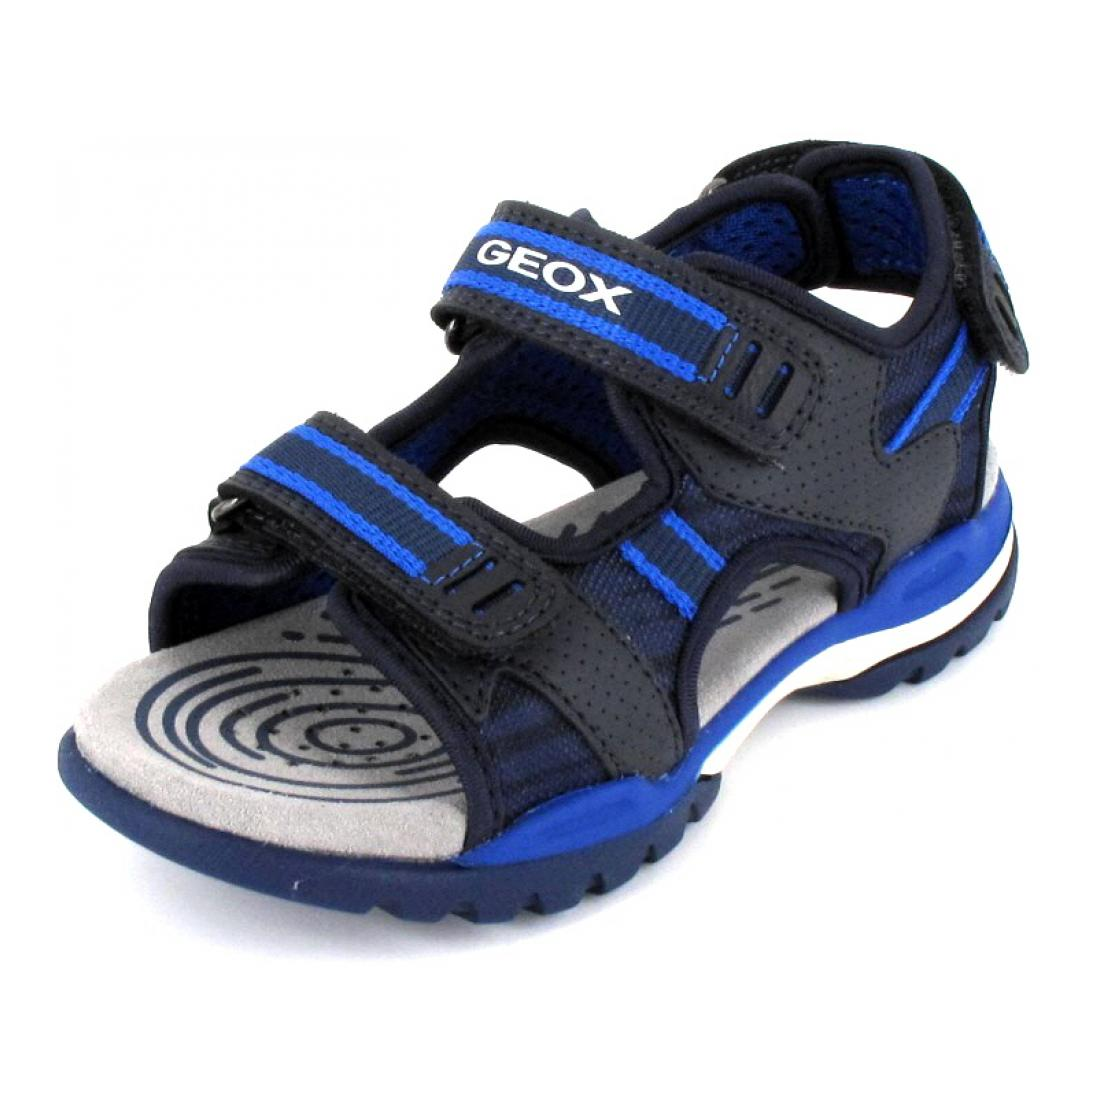 Geox Sandale J BOREALIS